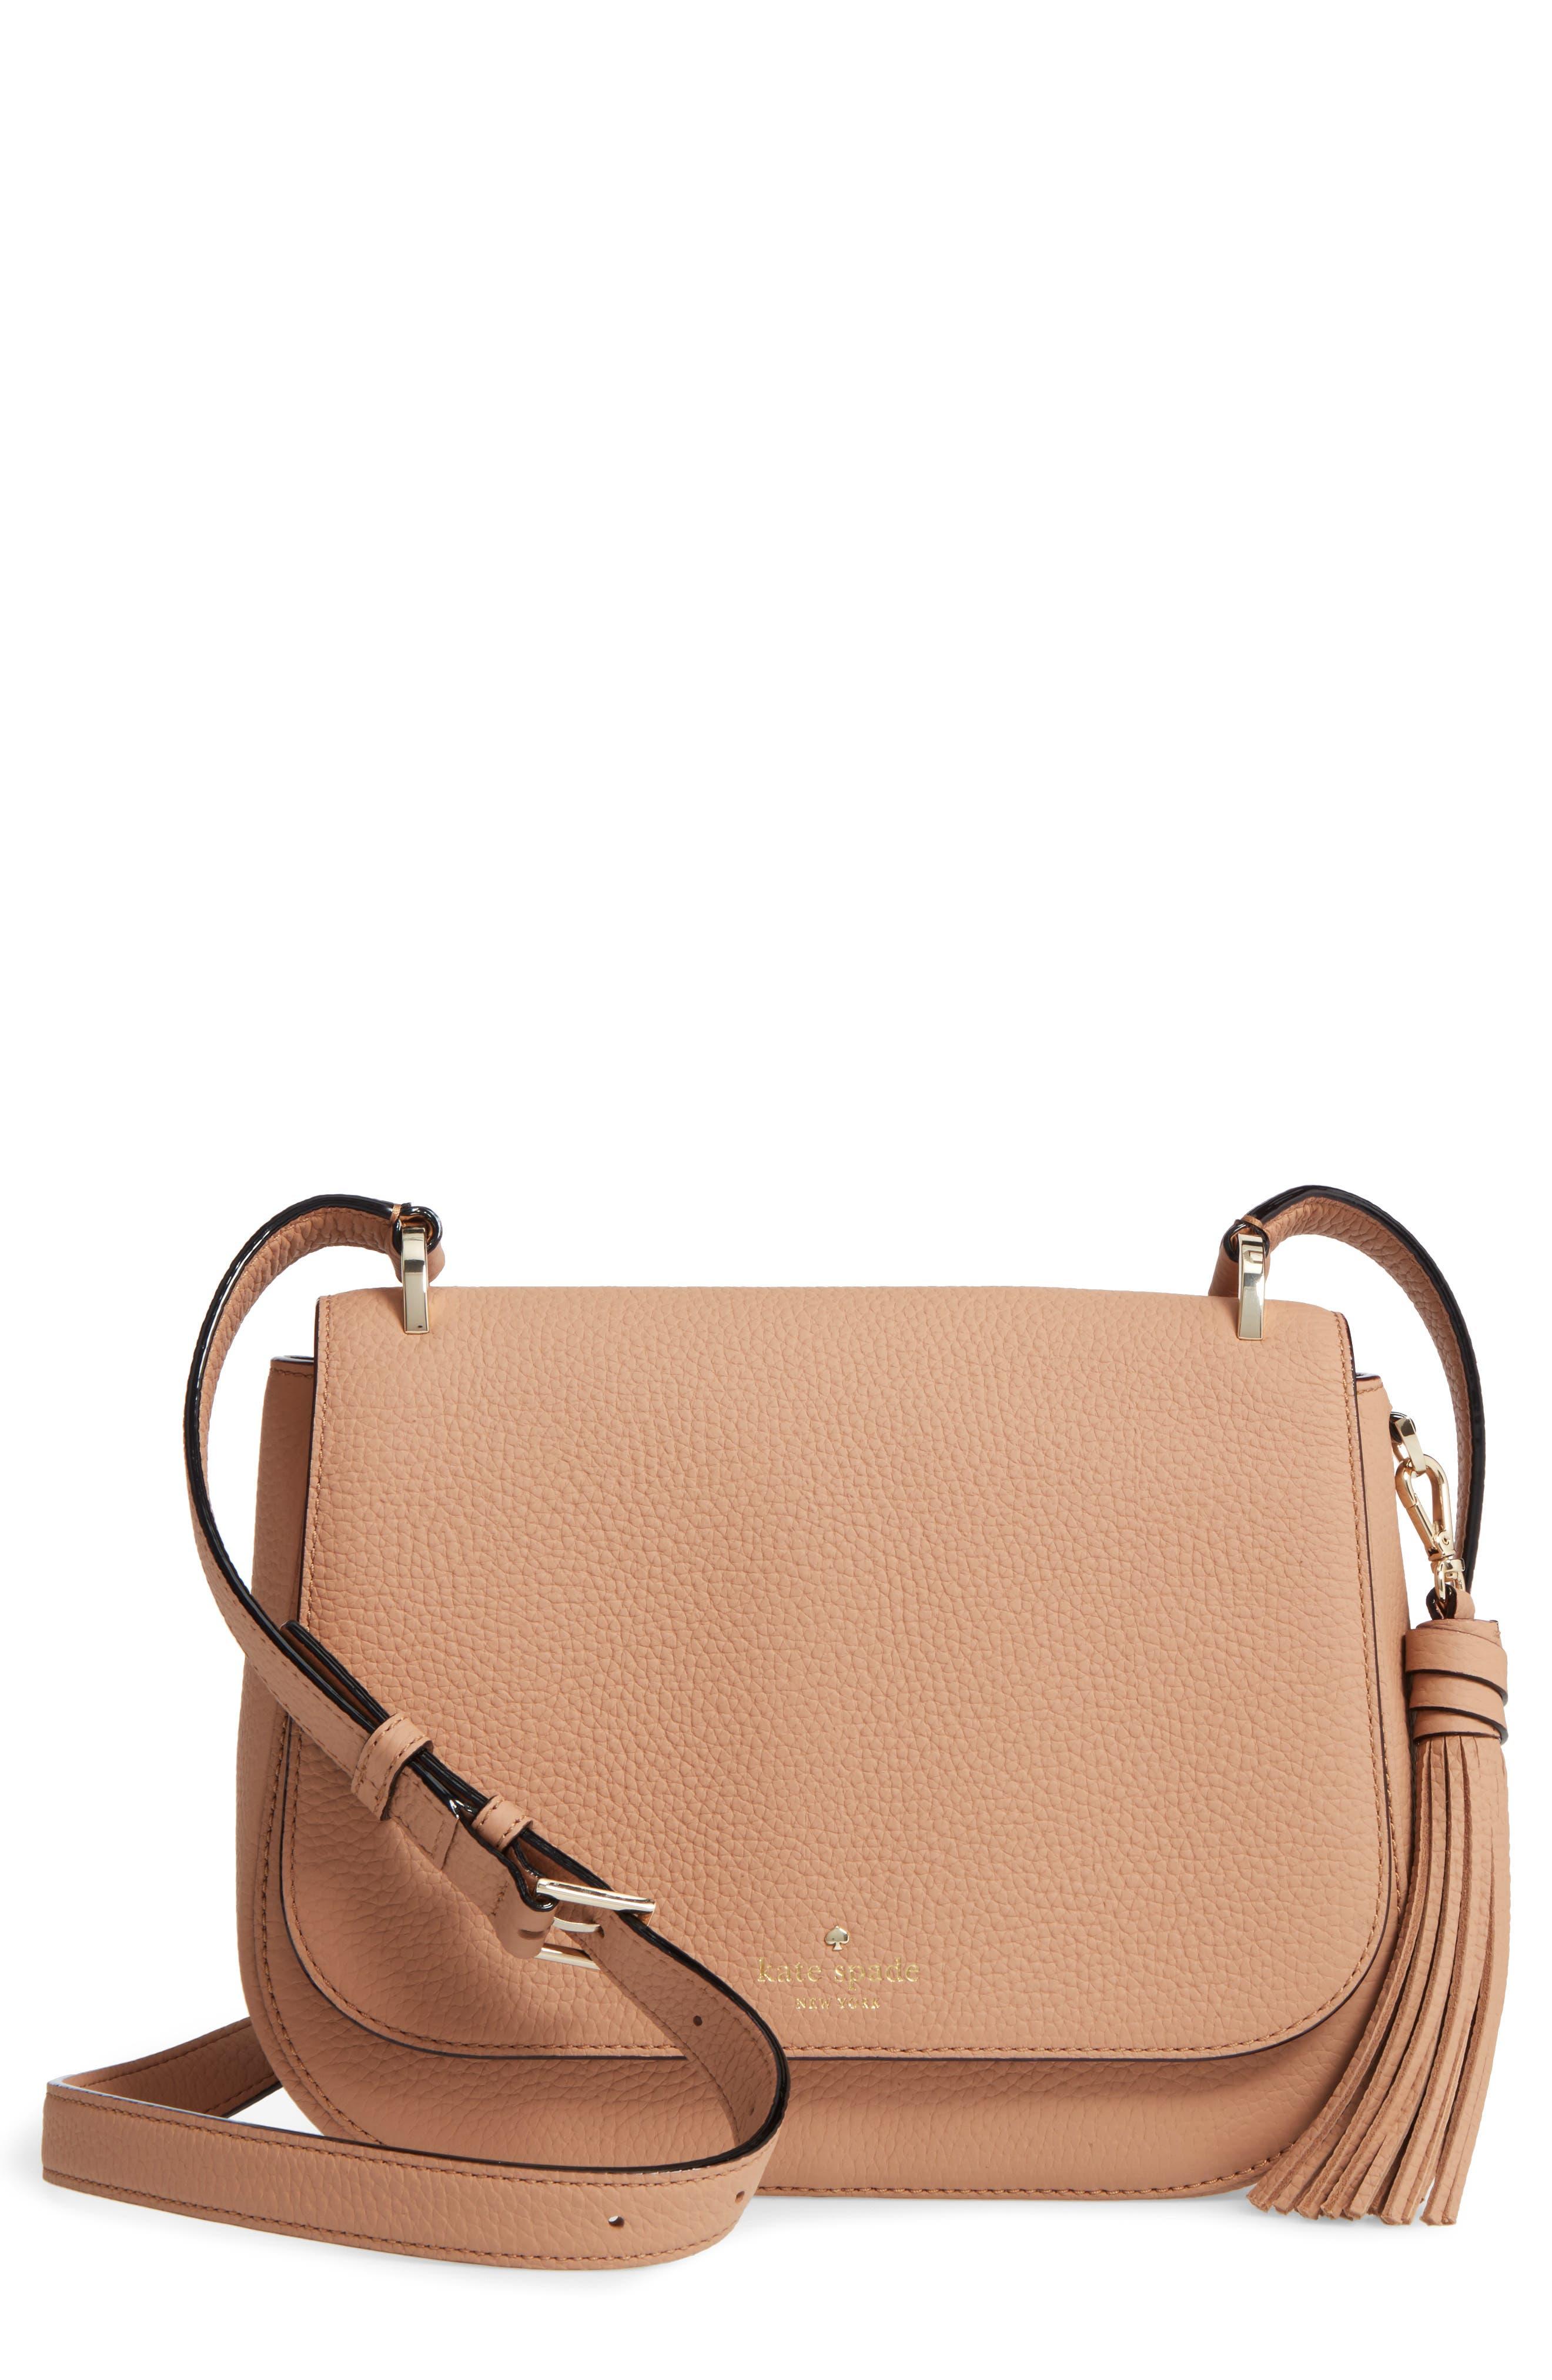 Main Image - kate spade new york daniels drive - tressa leather crossbody bag